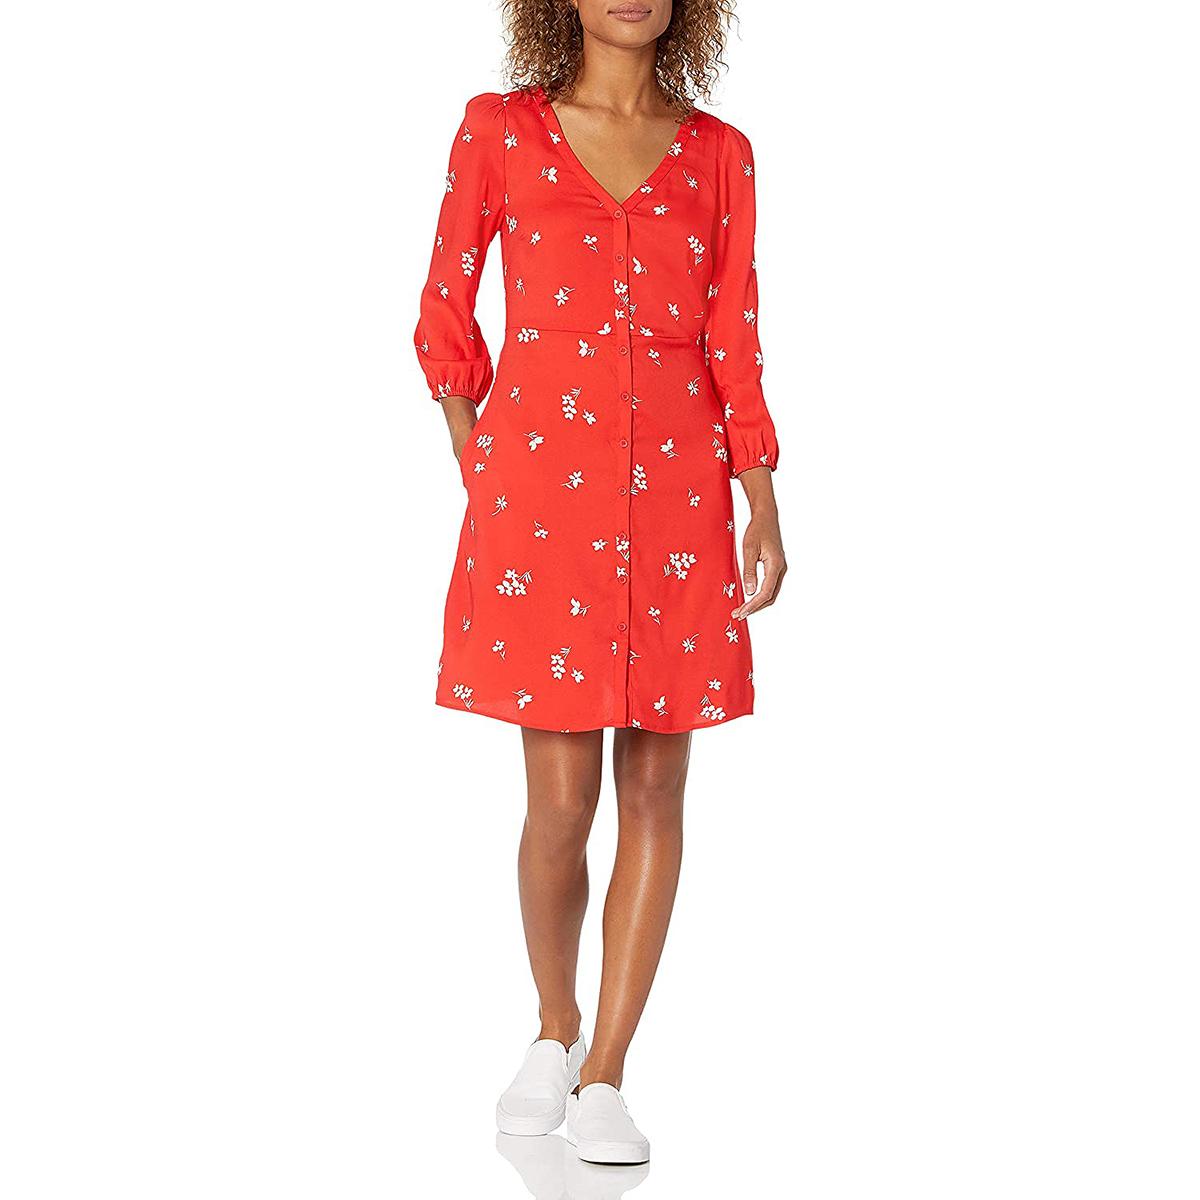 goodthreads-red-poppy-dress